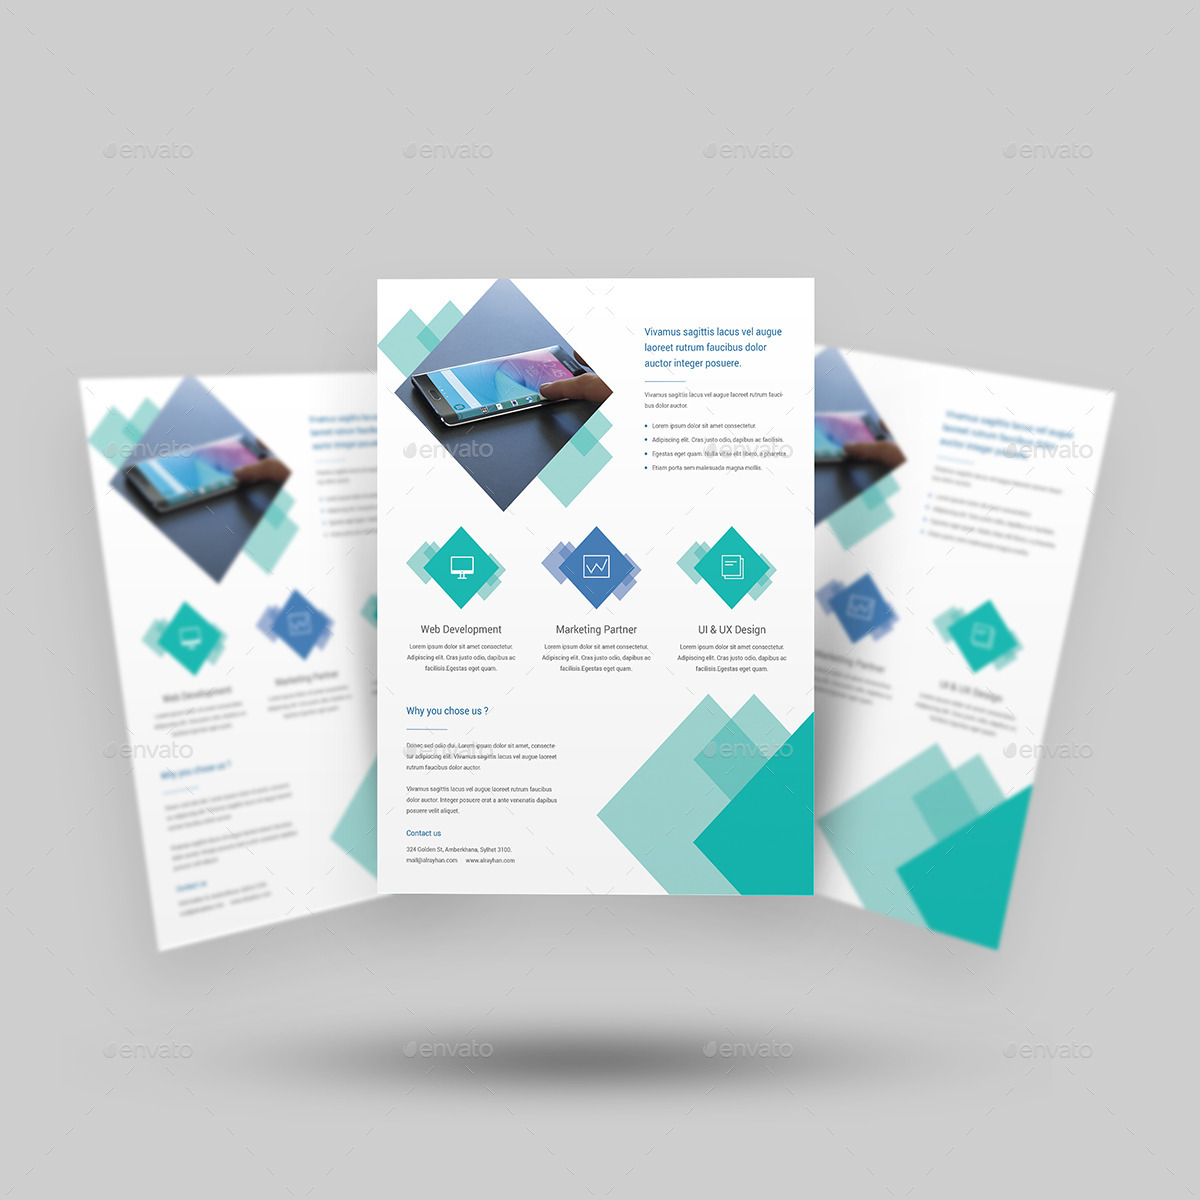 digital agency flyer templates by rtralrayhan